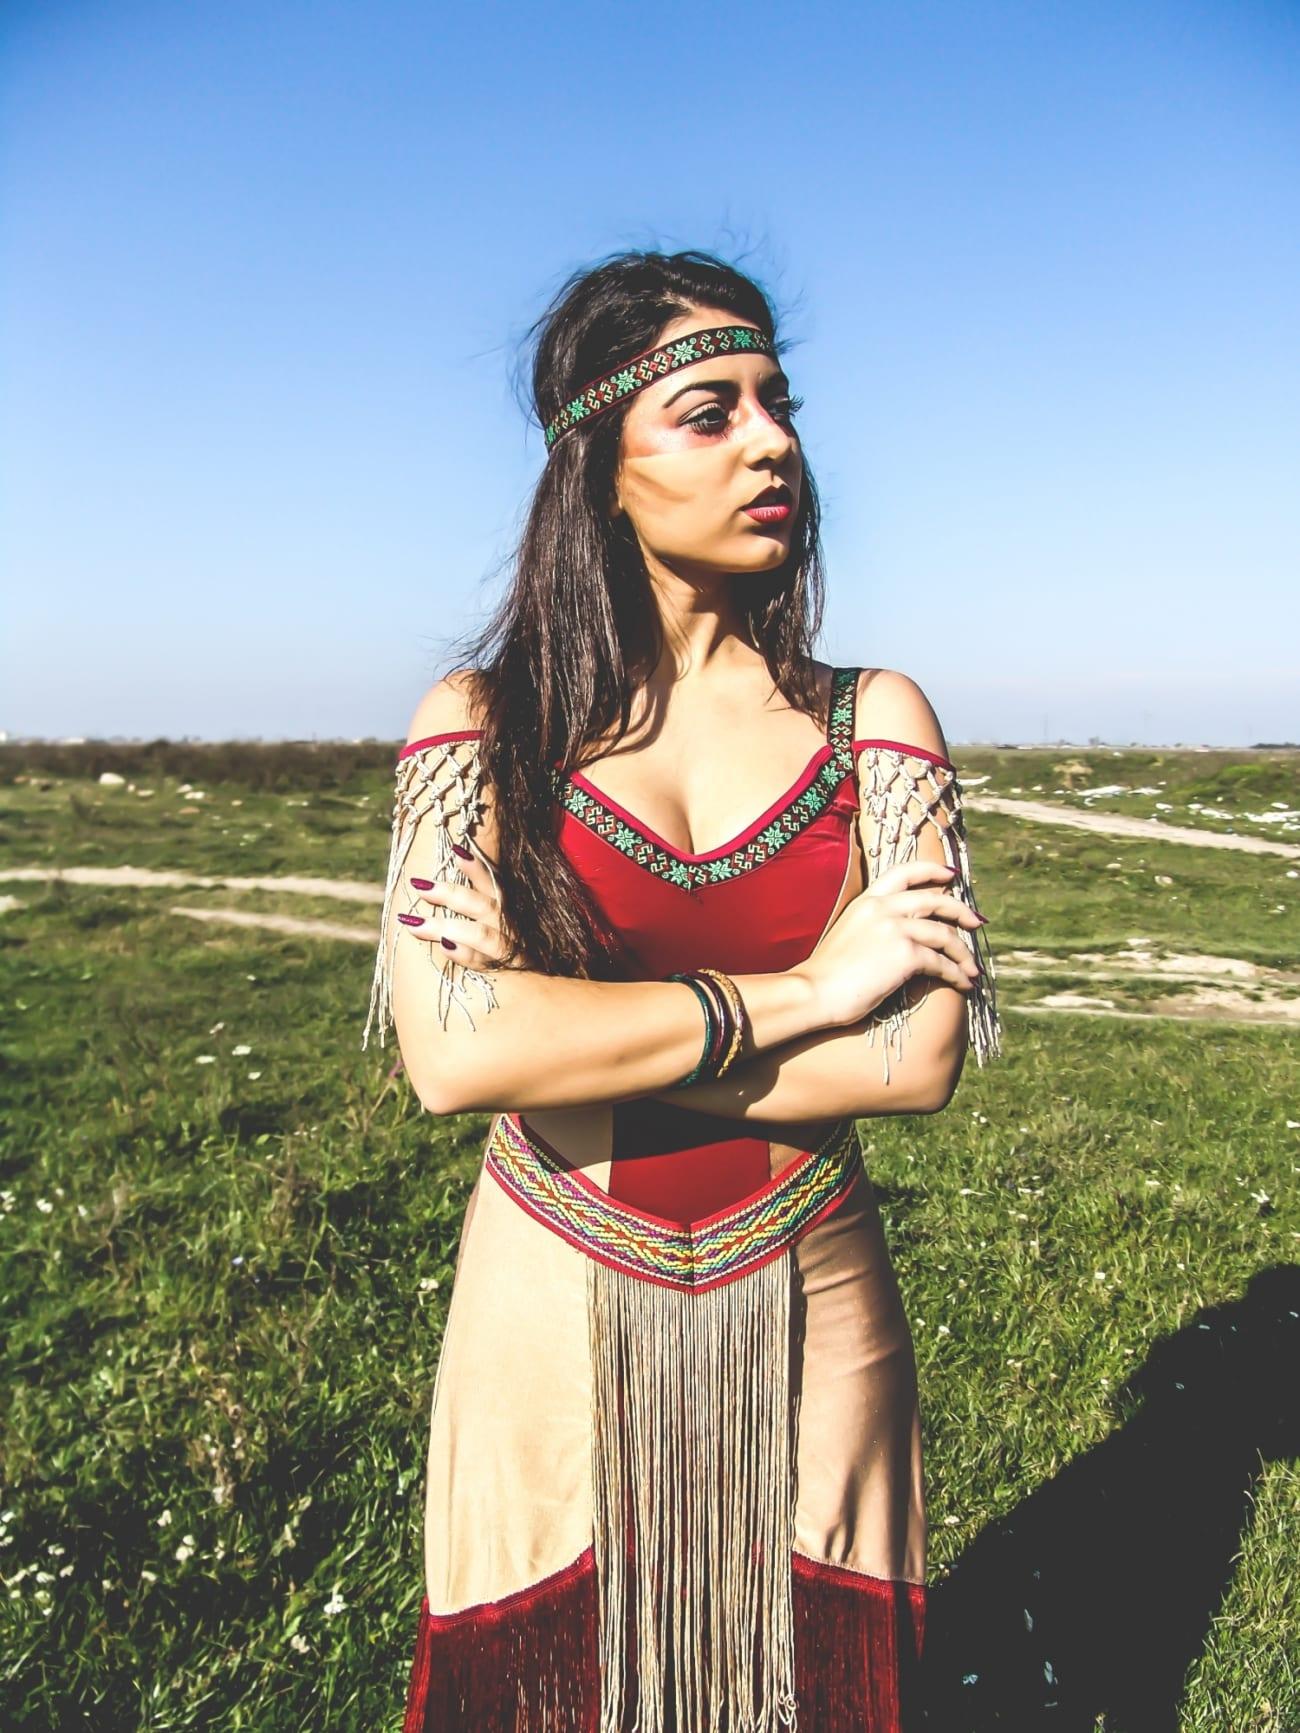 roxi rose fashion blog romania halloween indian native costume wildfashion (1)